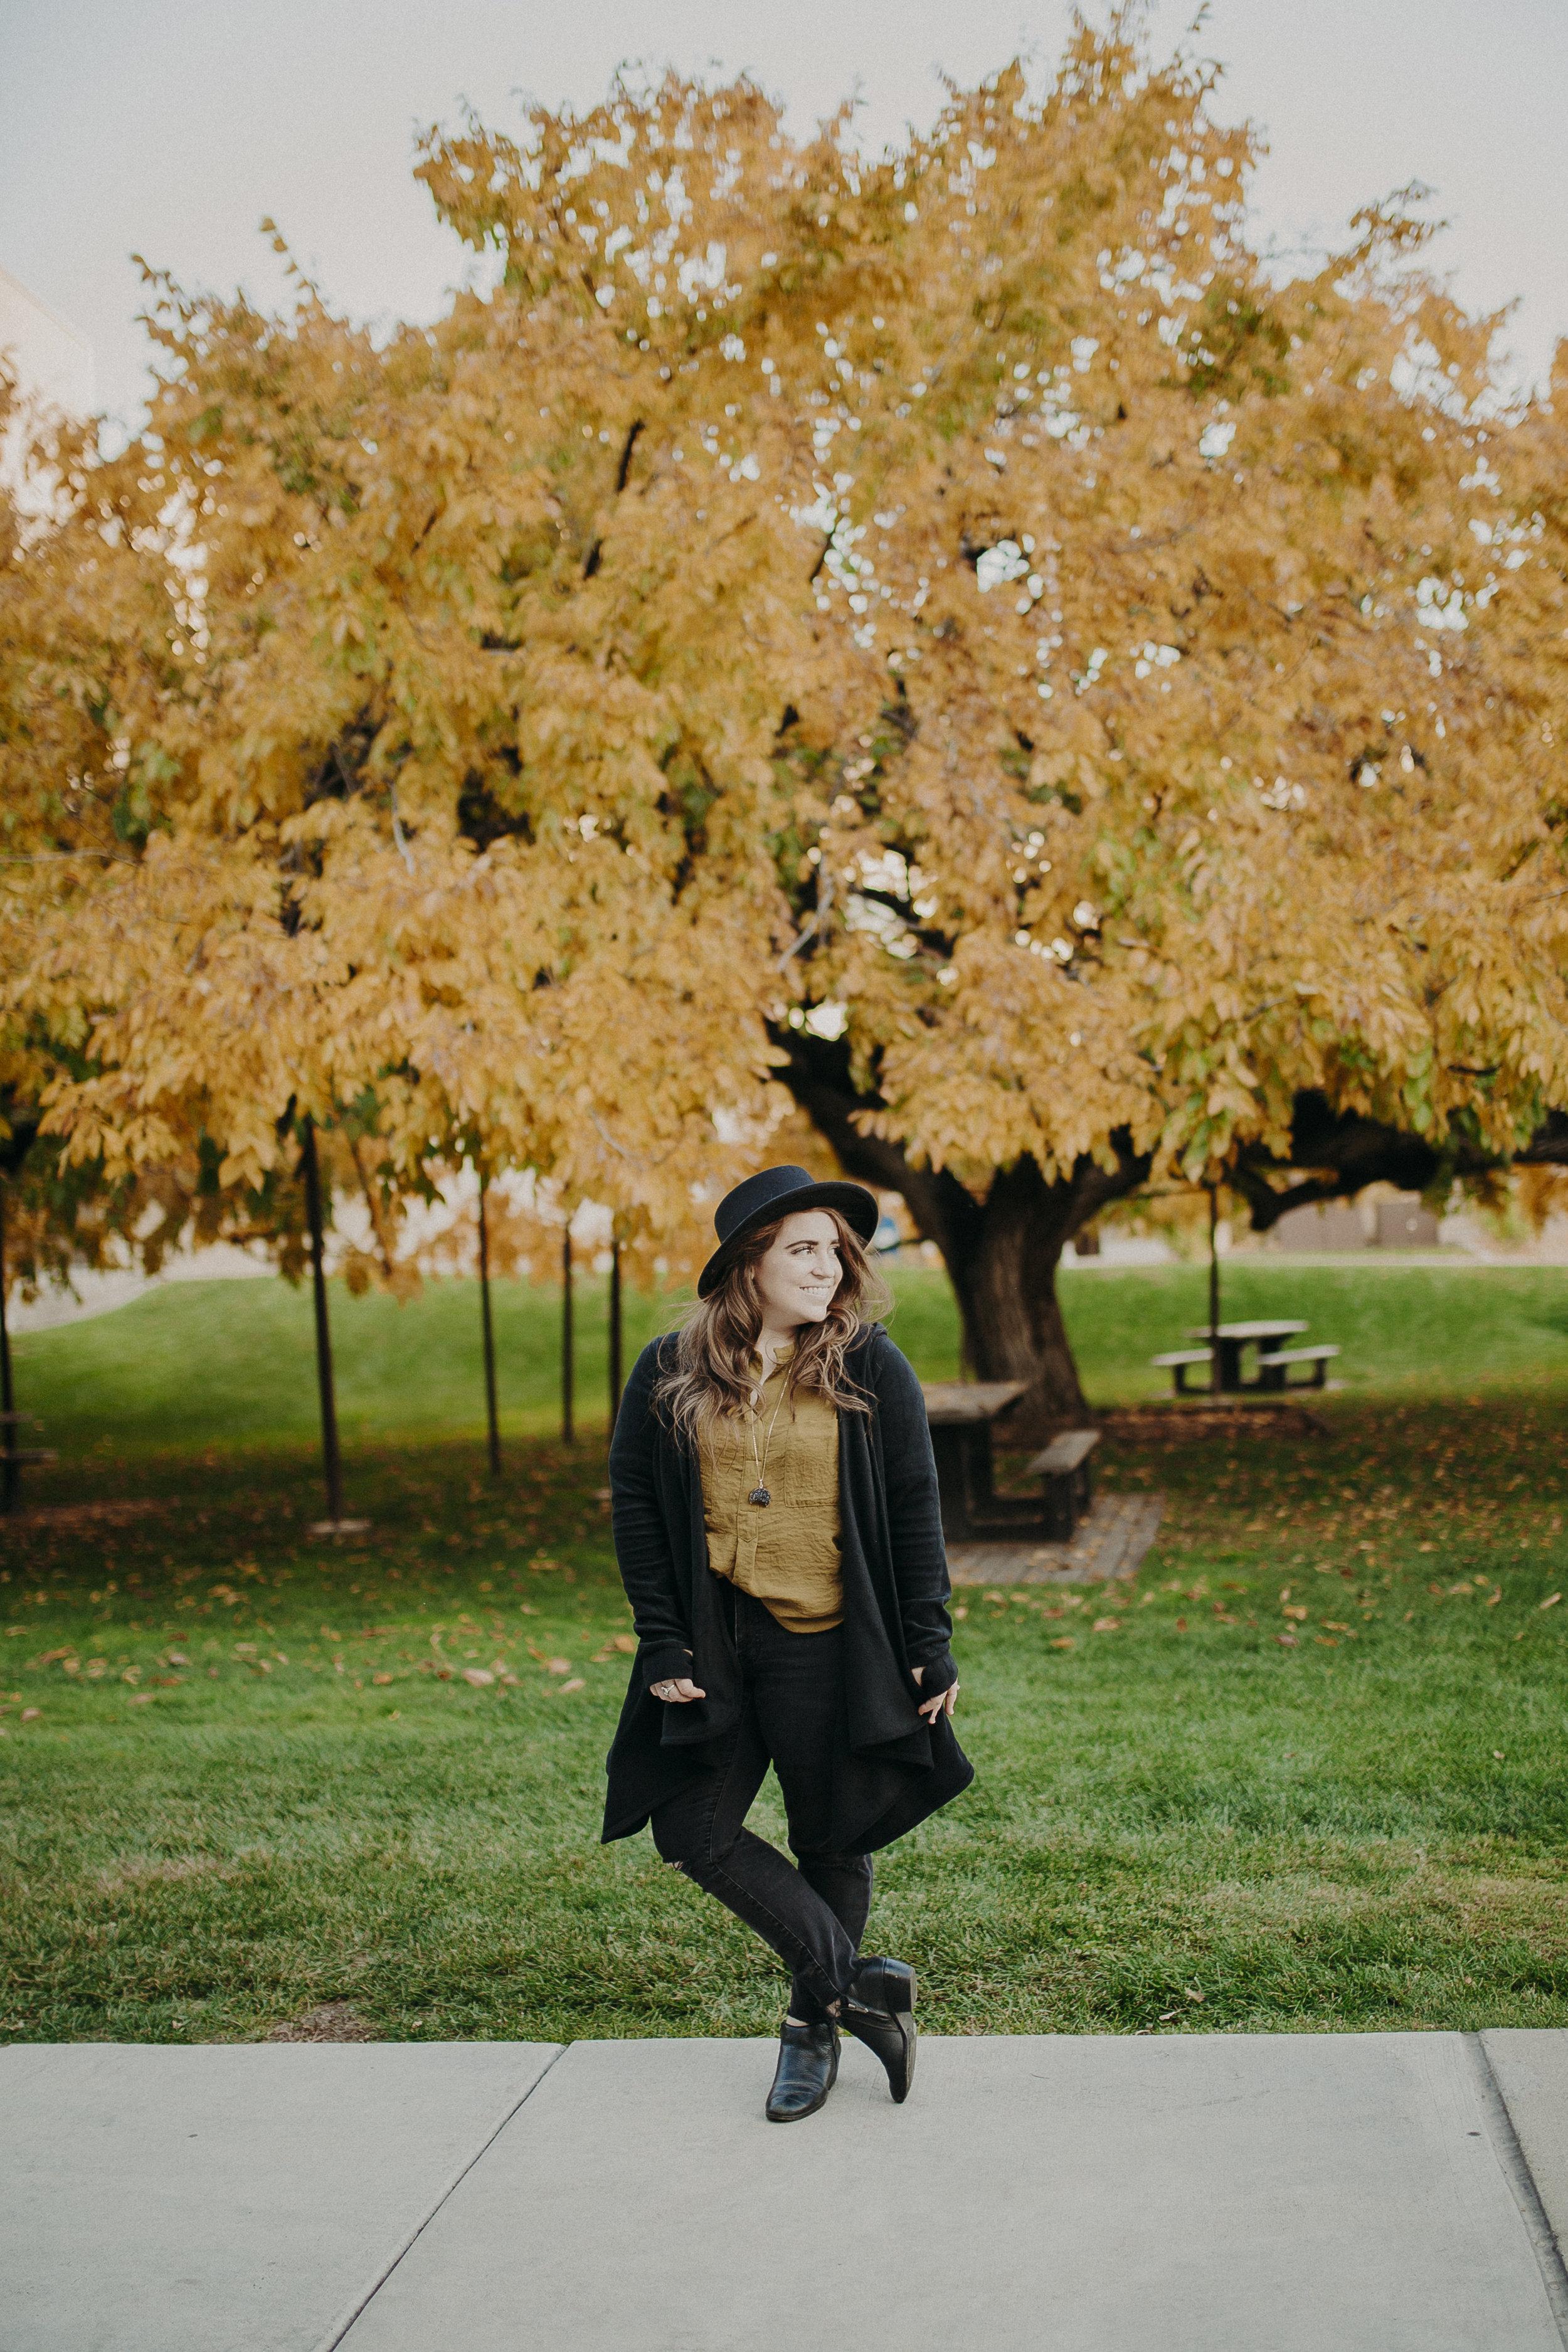 fall-outfit-ideas-12.jpg